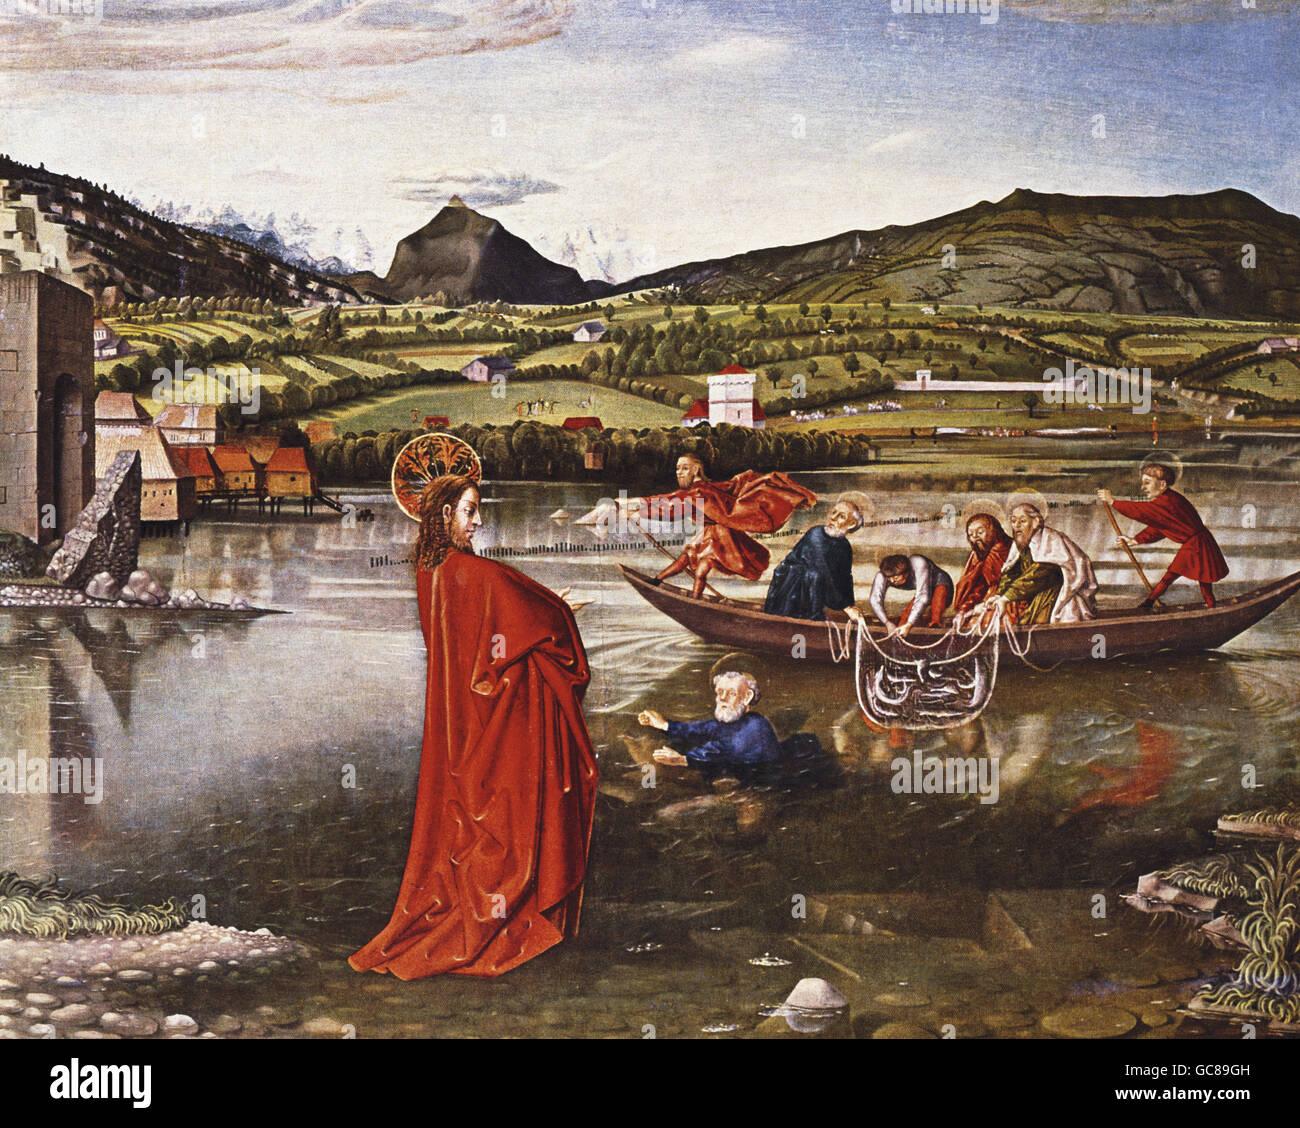 Bellas artes, Witz, Konrad (1400 - 1446), pintura, 'El milagroso Proyecto de Pescado', 'Saint Peter Altar', el panel central, Alemania, 1444, Musée d'Art et d'Histoire, Ginebra, Foto de stock